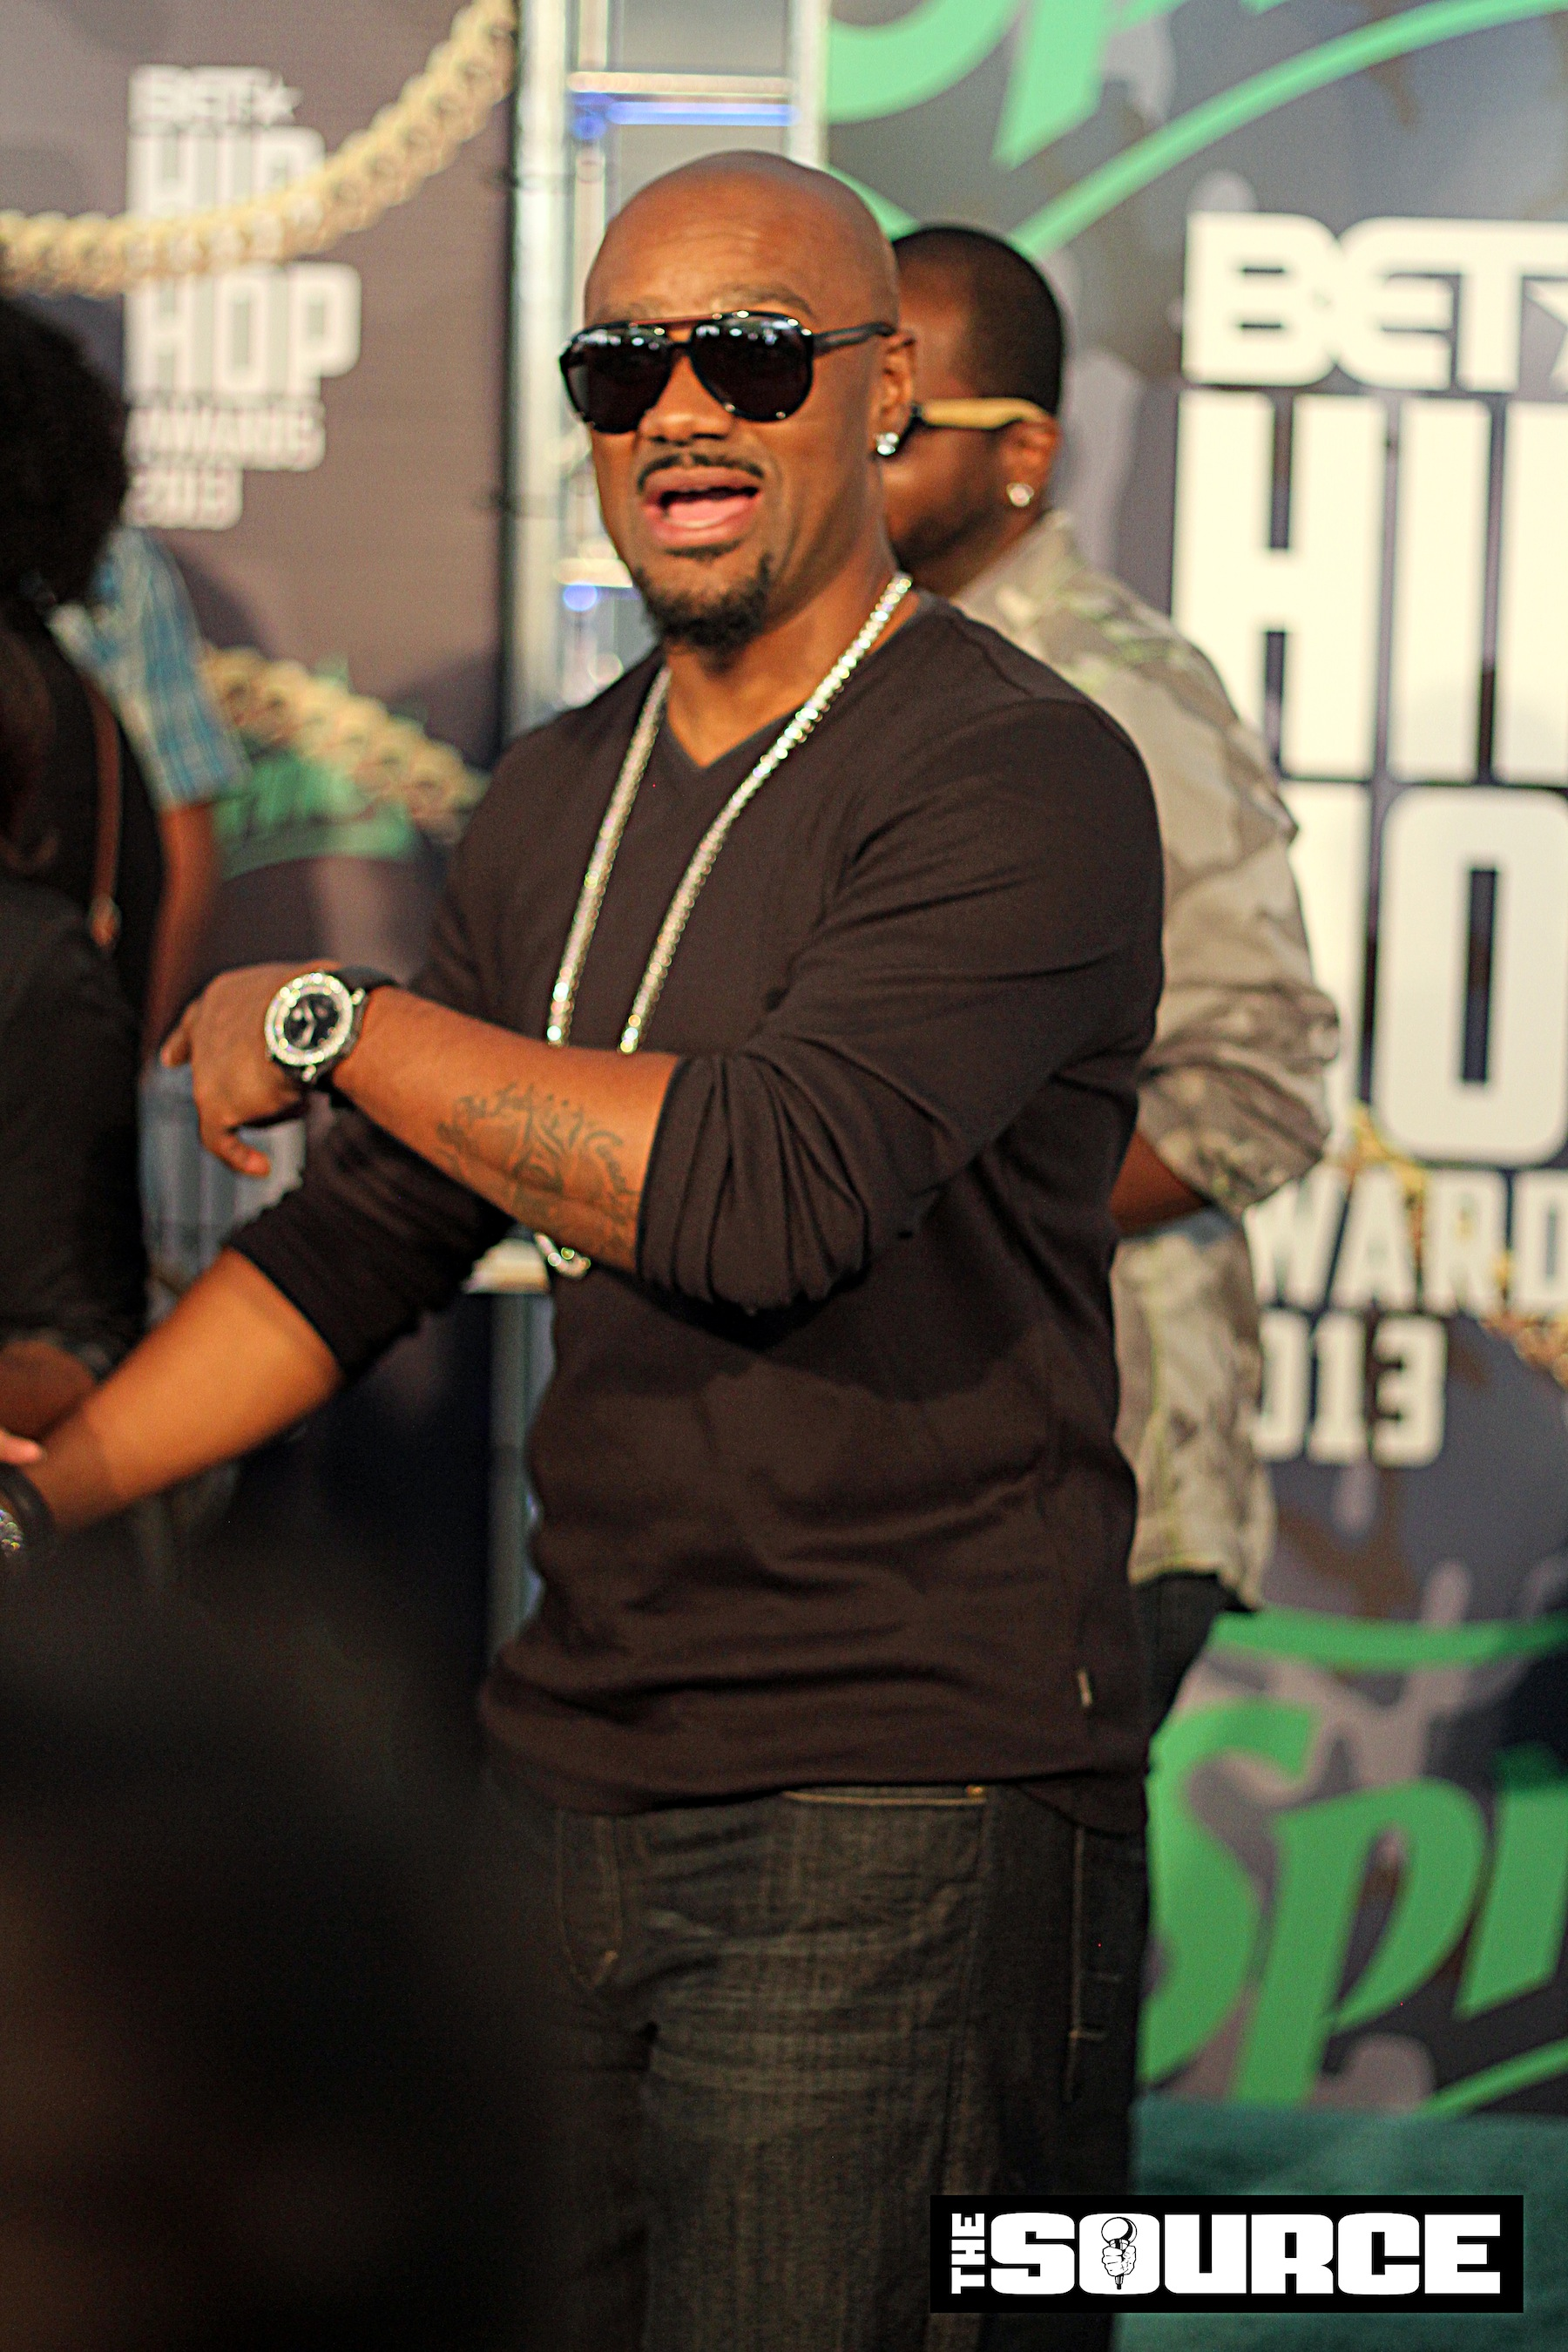 Cassidy 2015 Rapper